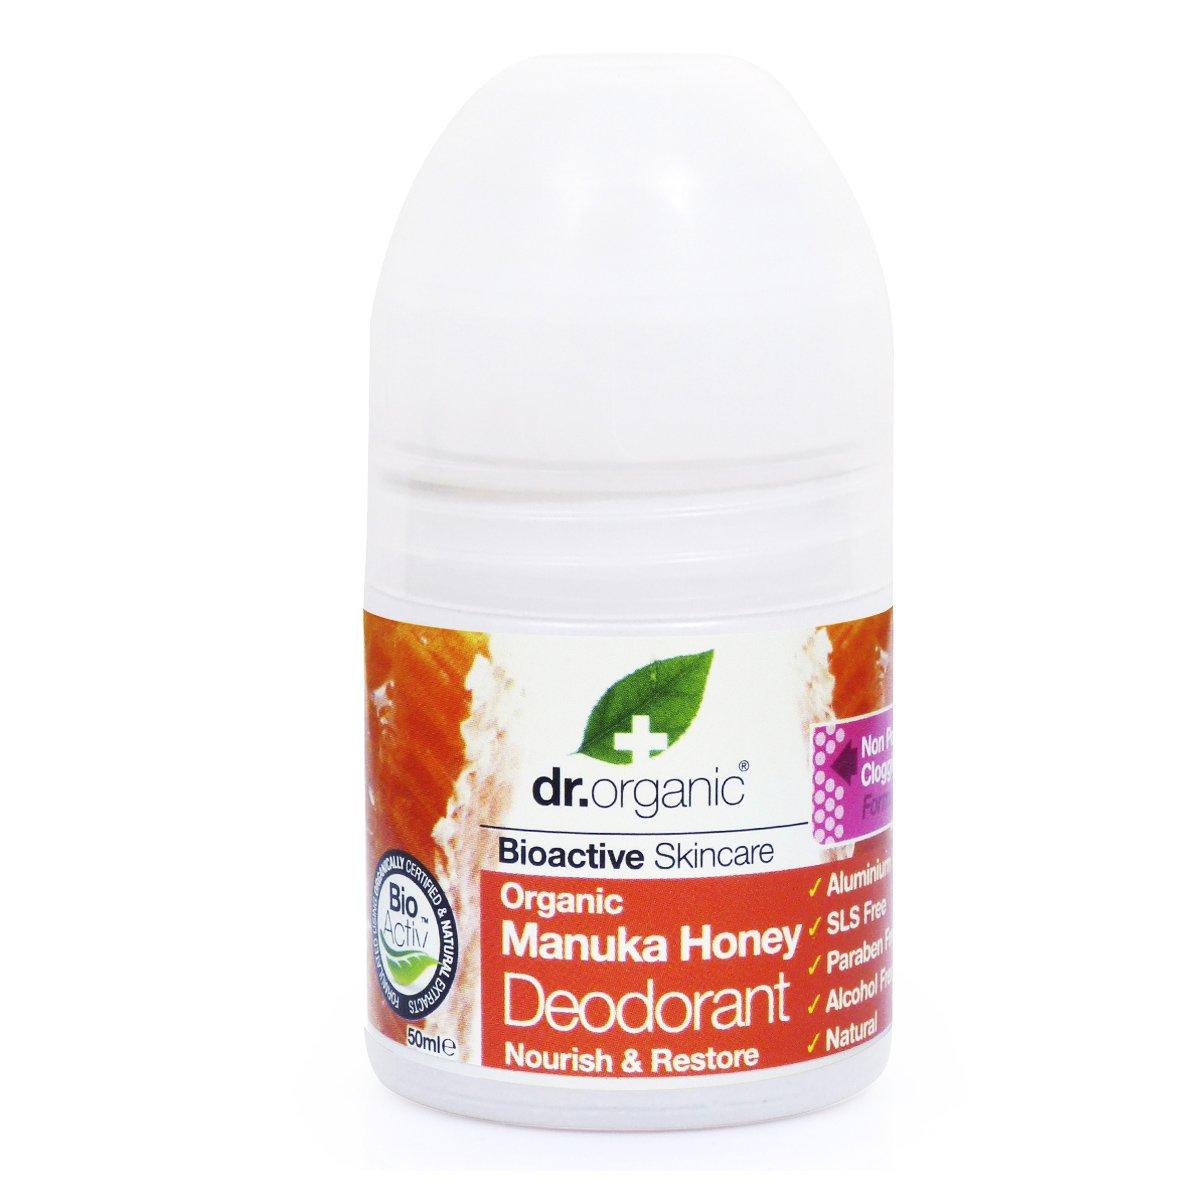 Dr Organic Organic Manuka Honey Deodorant Αποσμητικό με Βιολογικό Μέλι Μανούκα 50ml